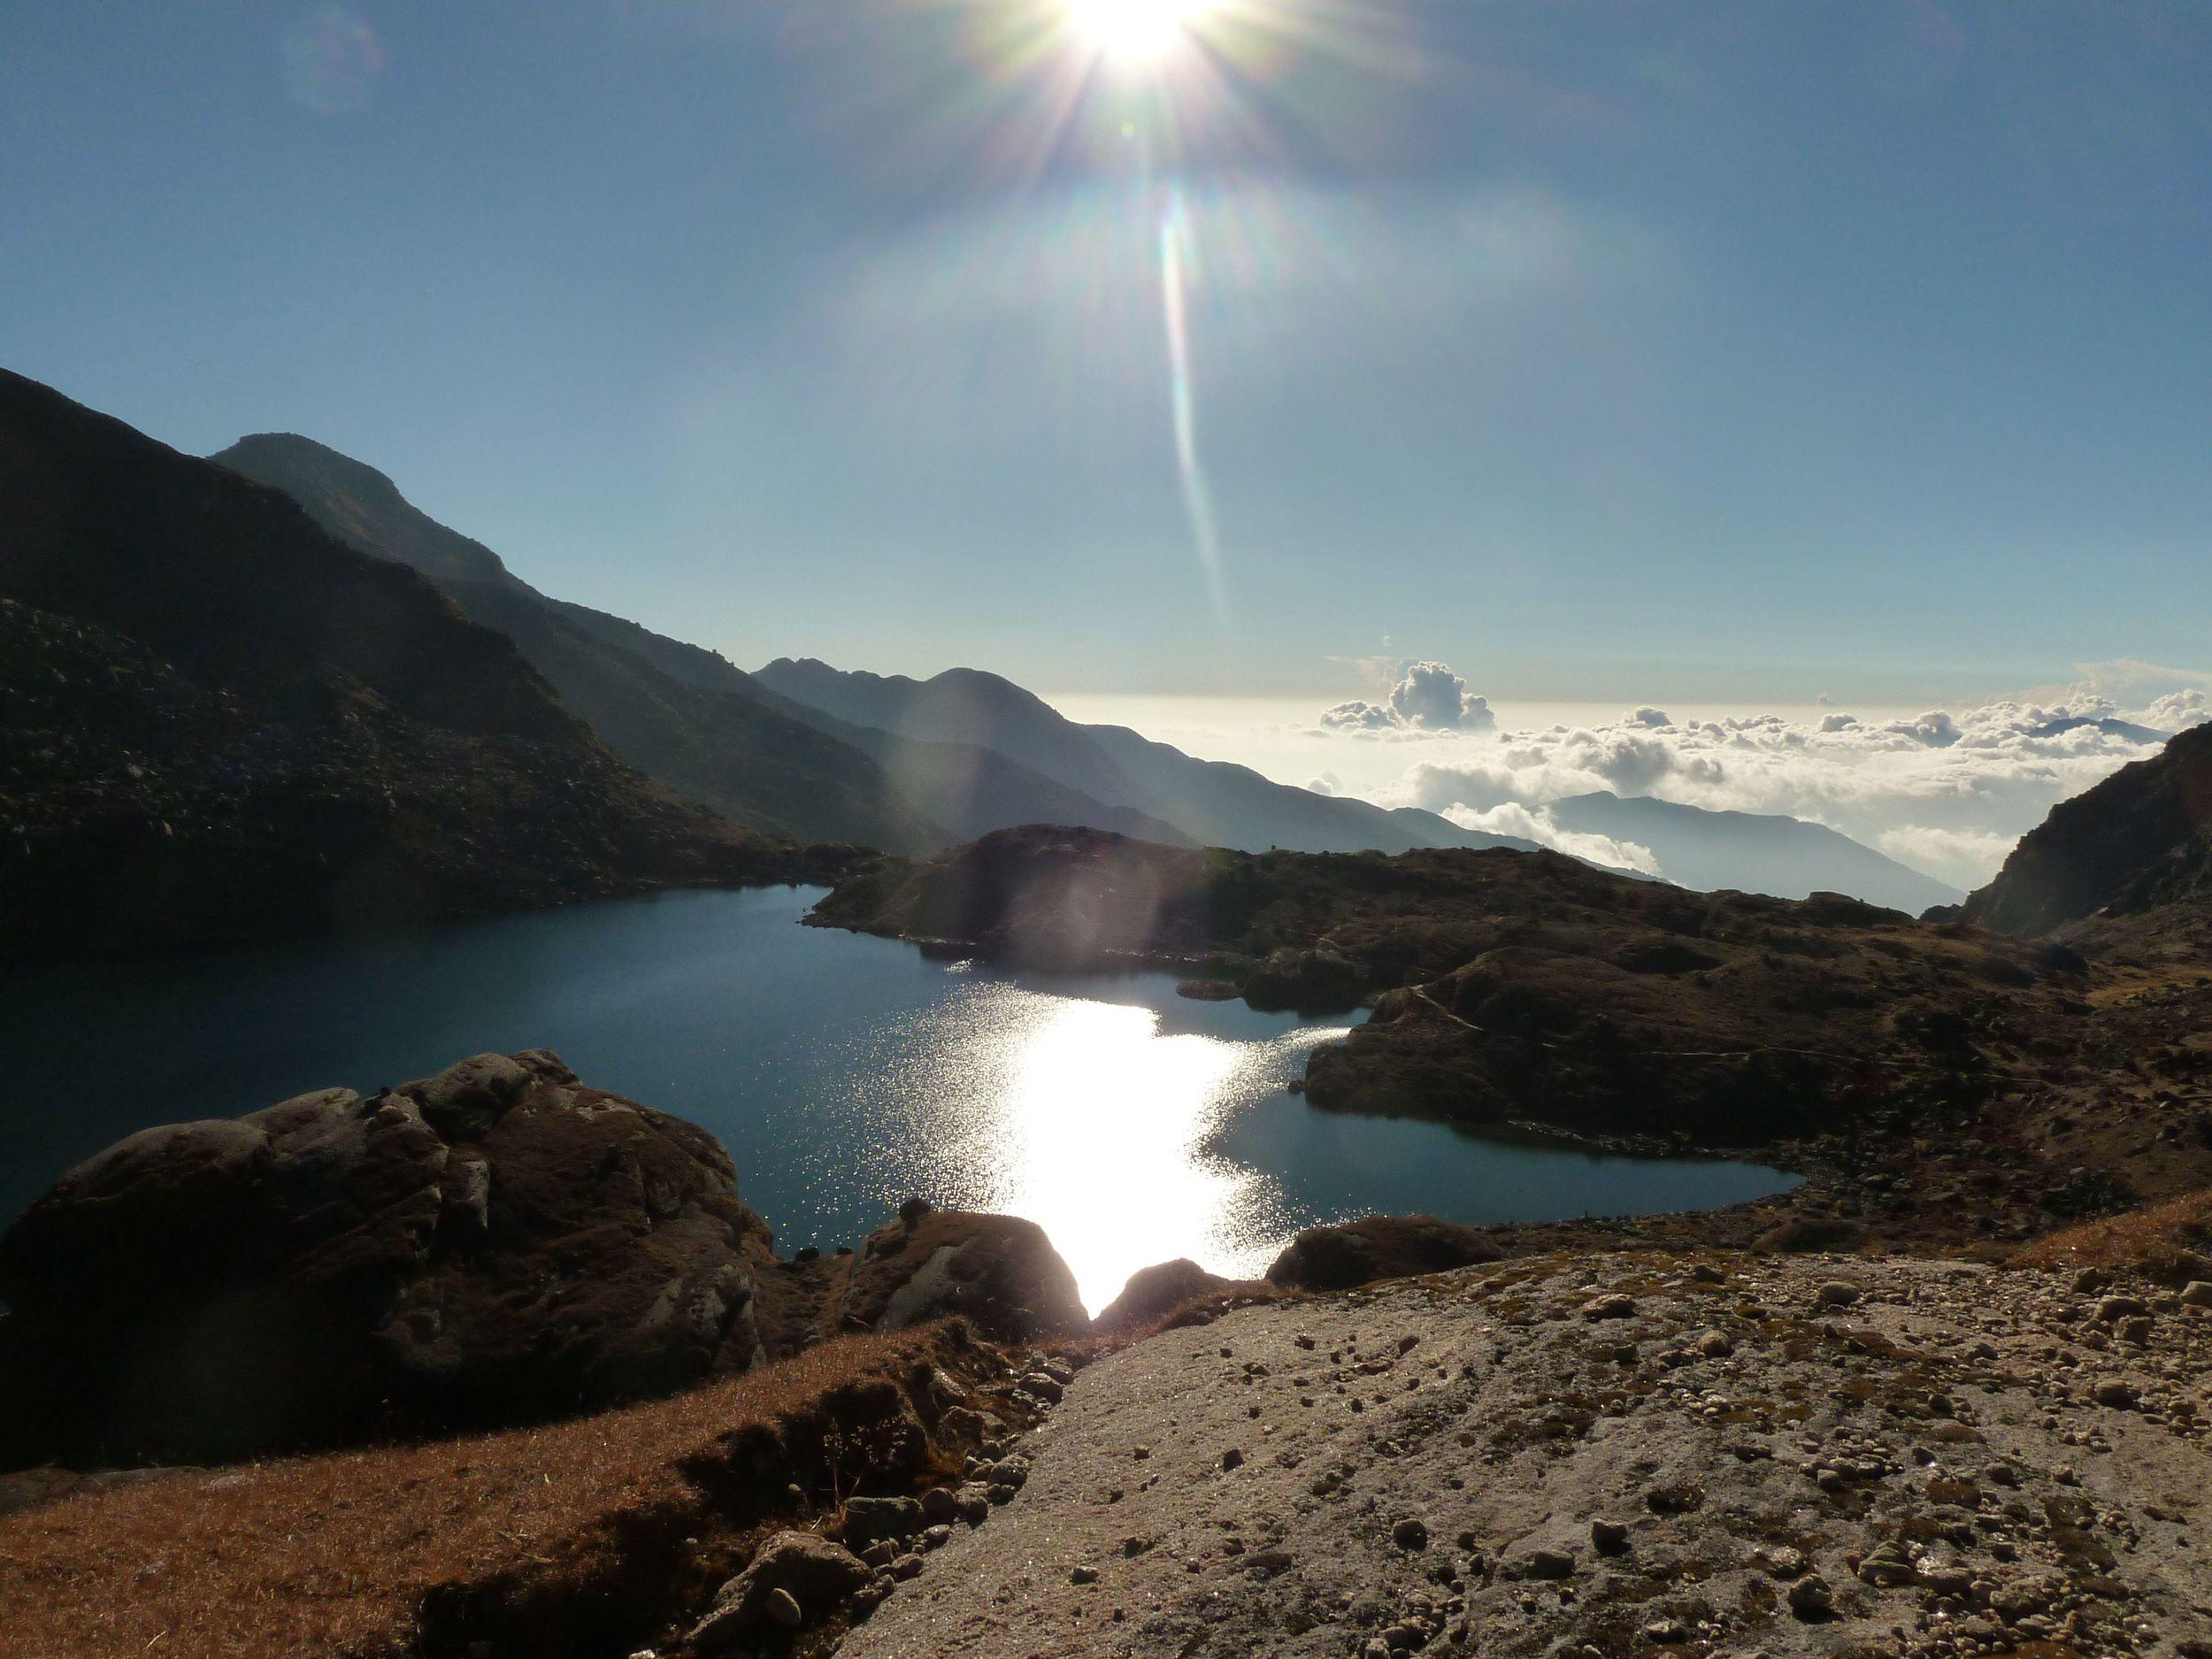 Infinity pool of the gods - Gosaikunda lakes